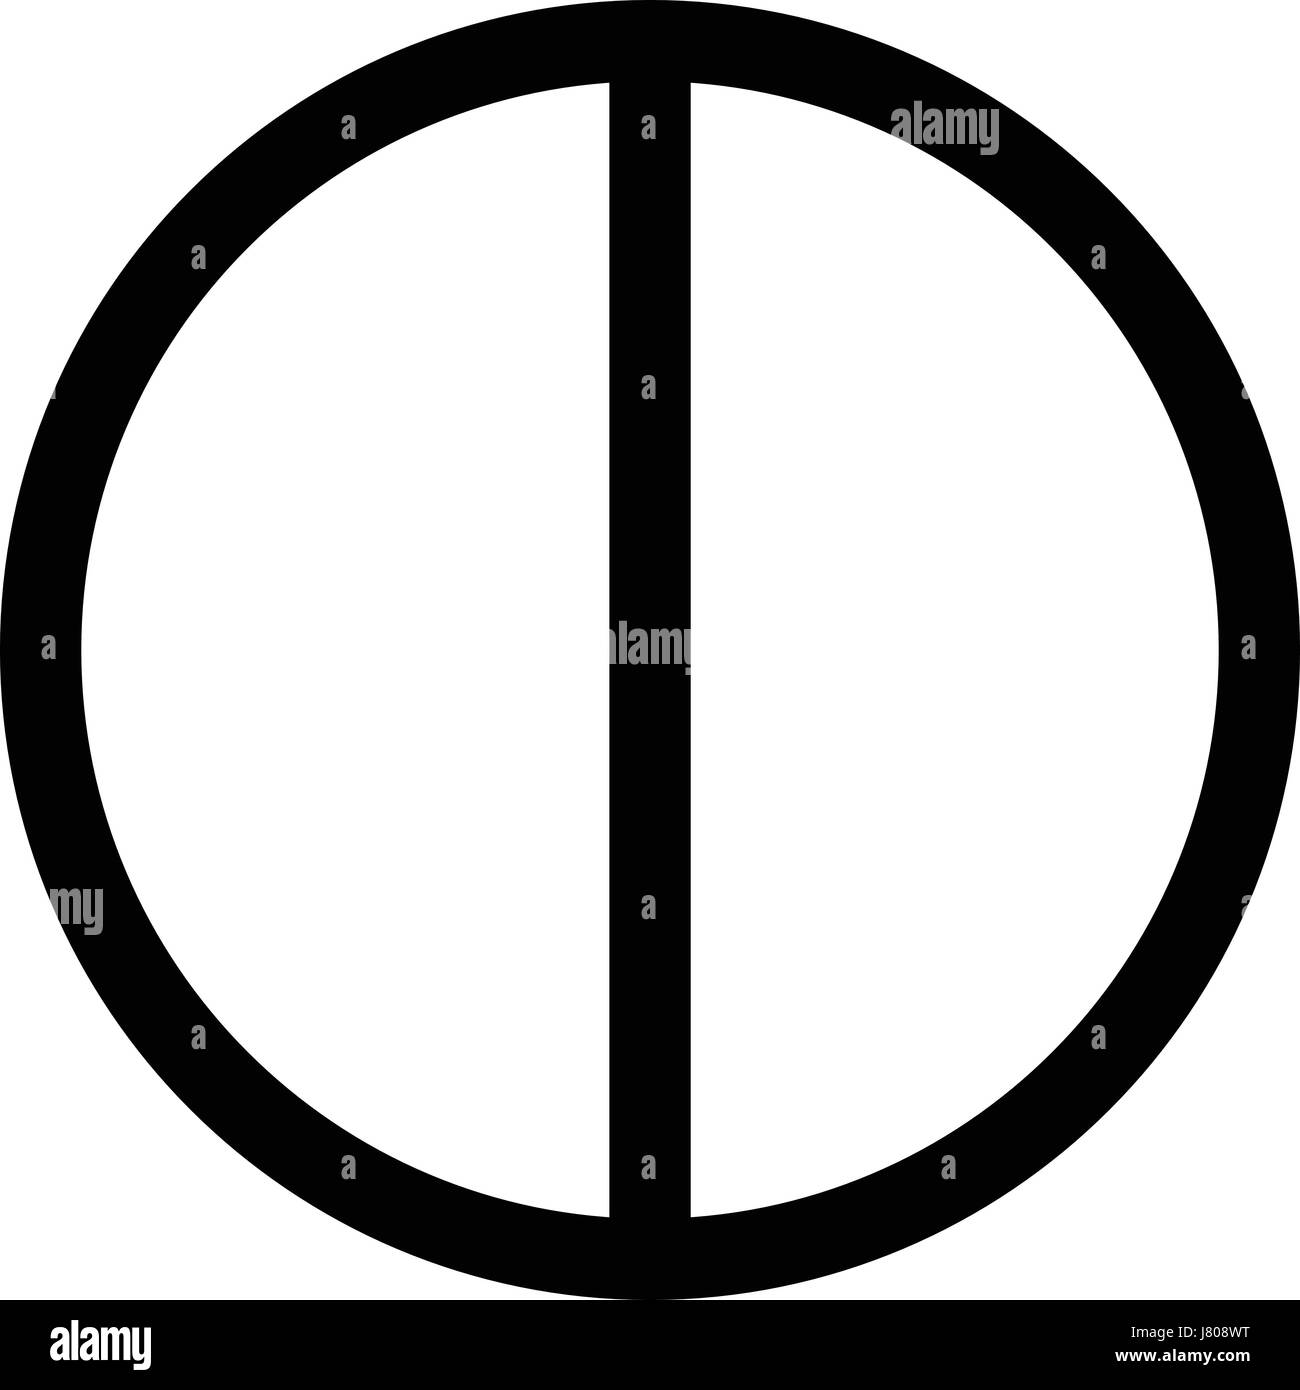 Pie Chart Half Stock Vector Art Illustration Vector Image